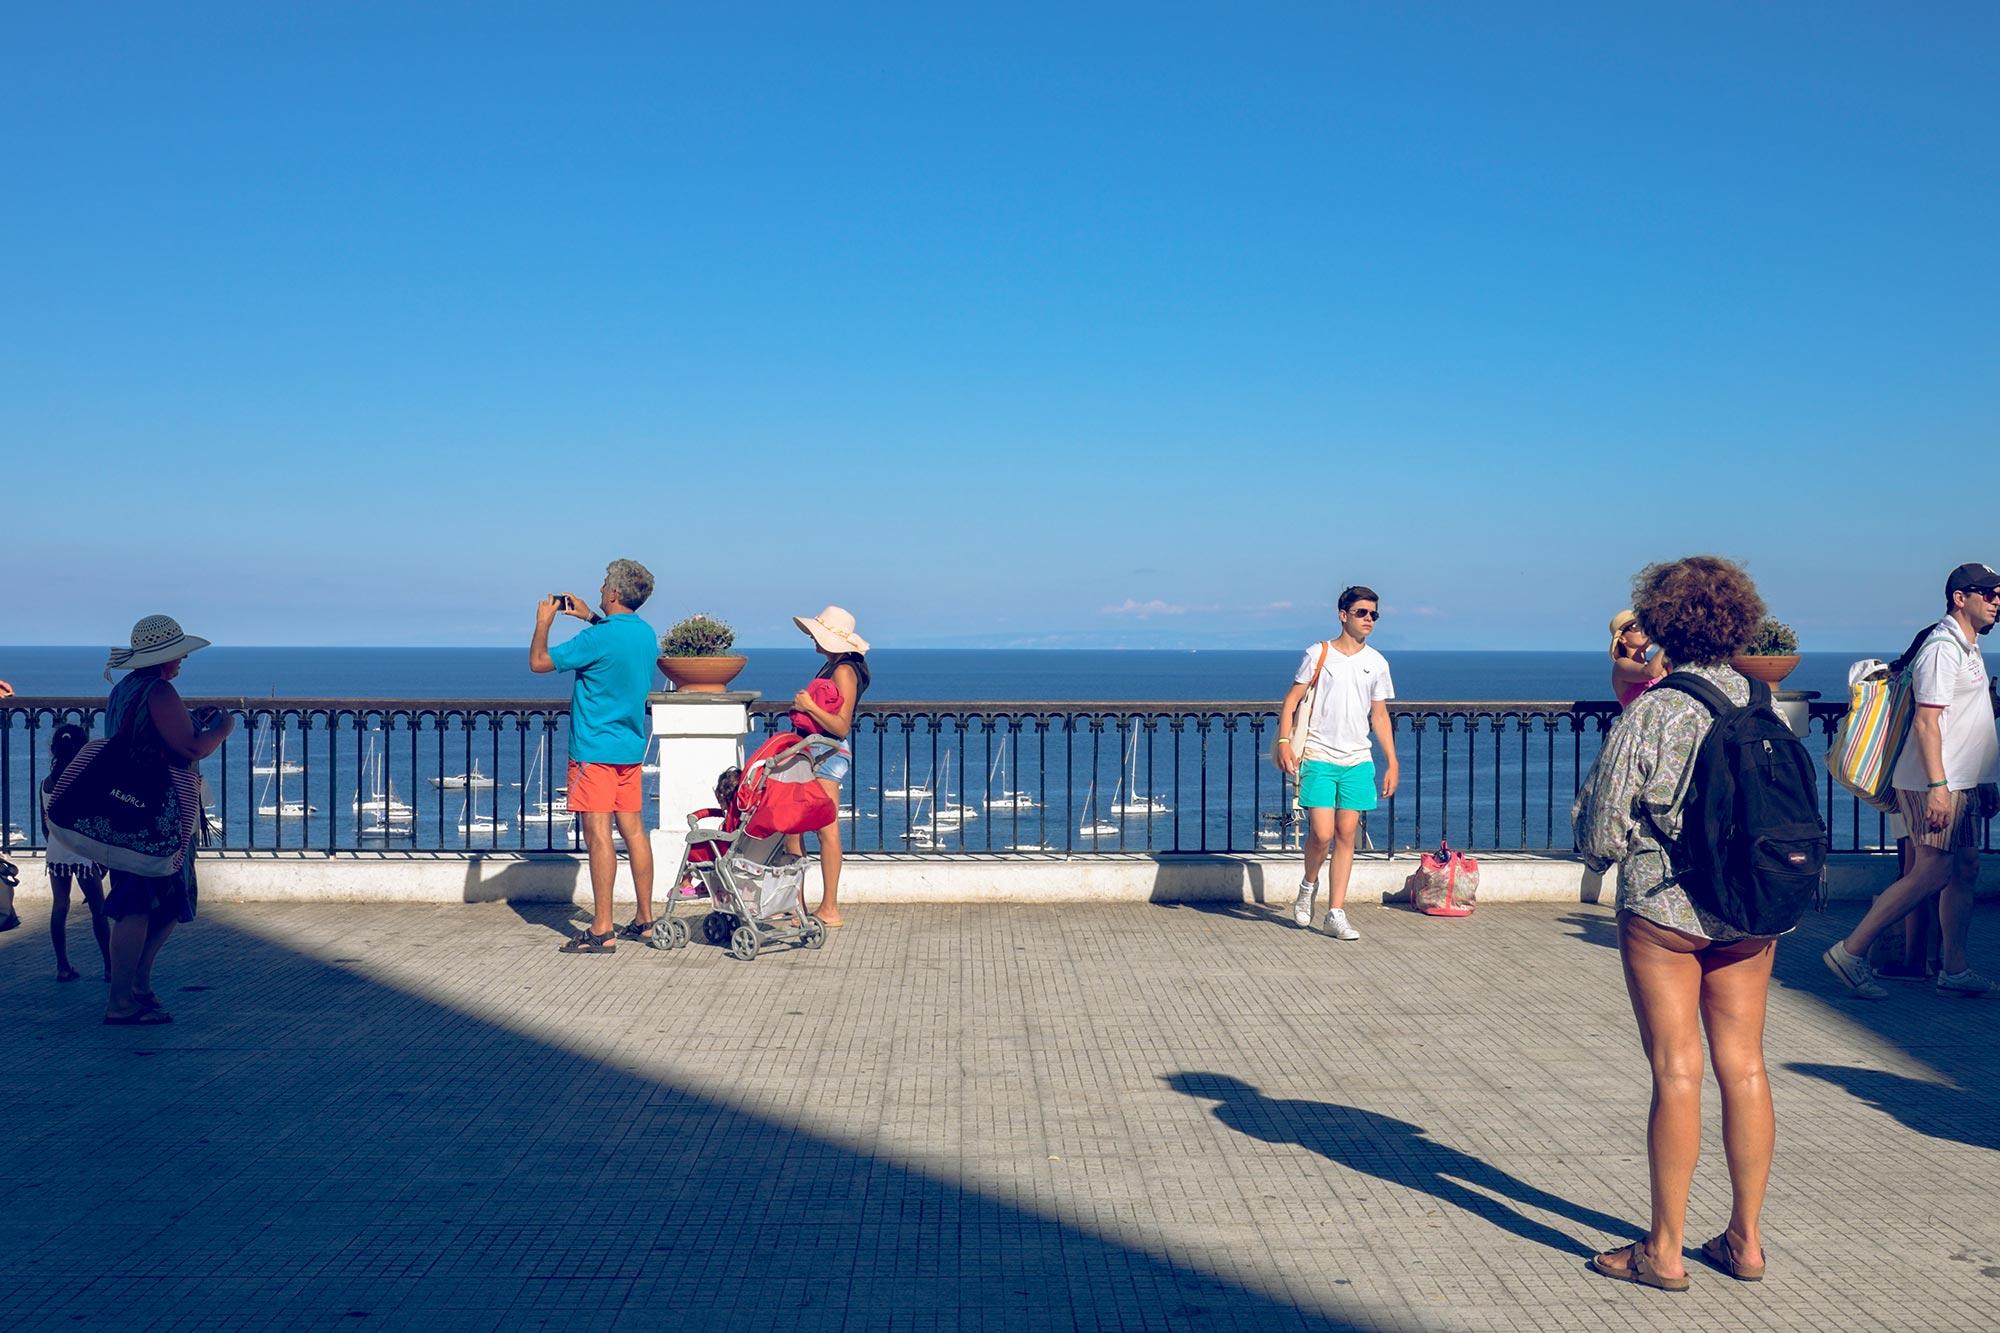 italy-sicilia-eolie-stromboli-terrace